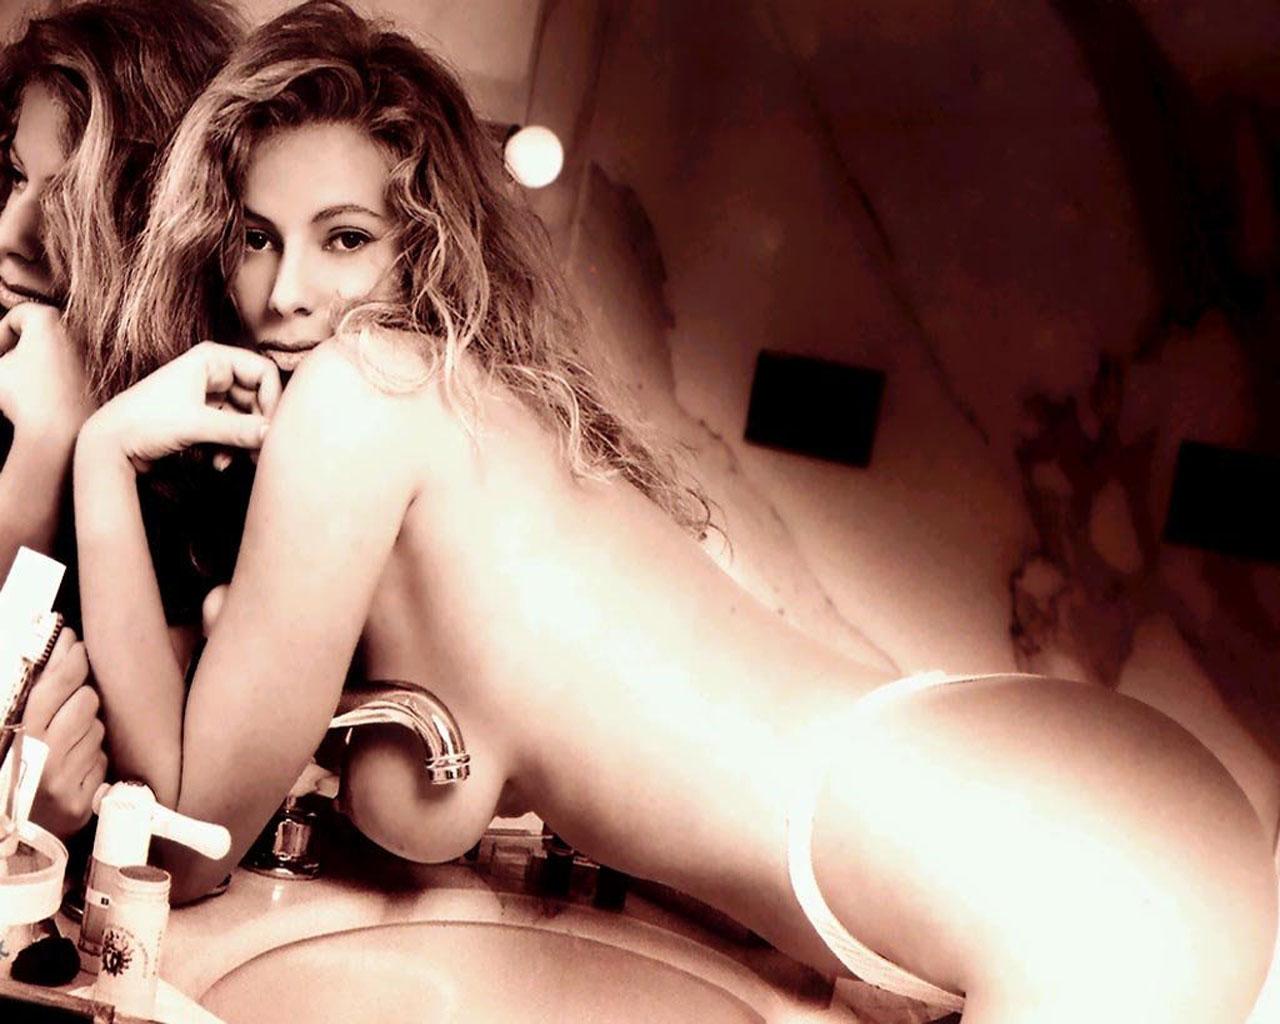 Nikita секс фото видео